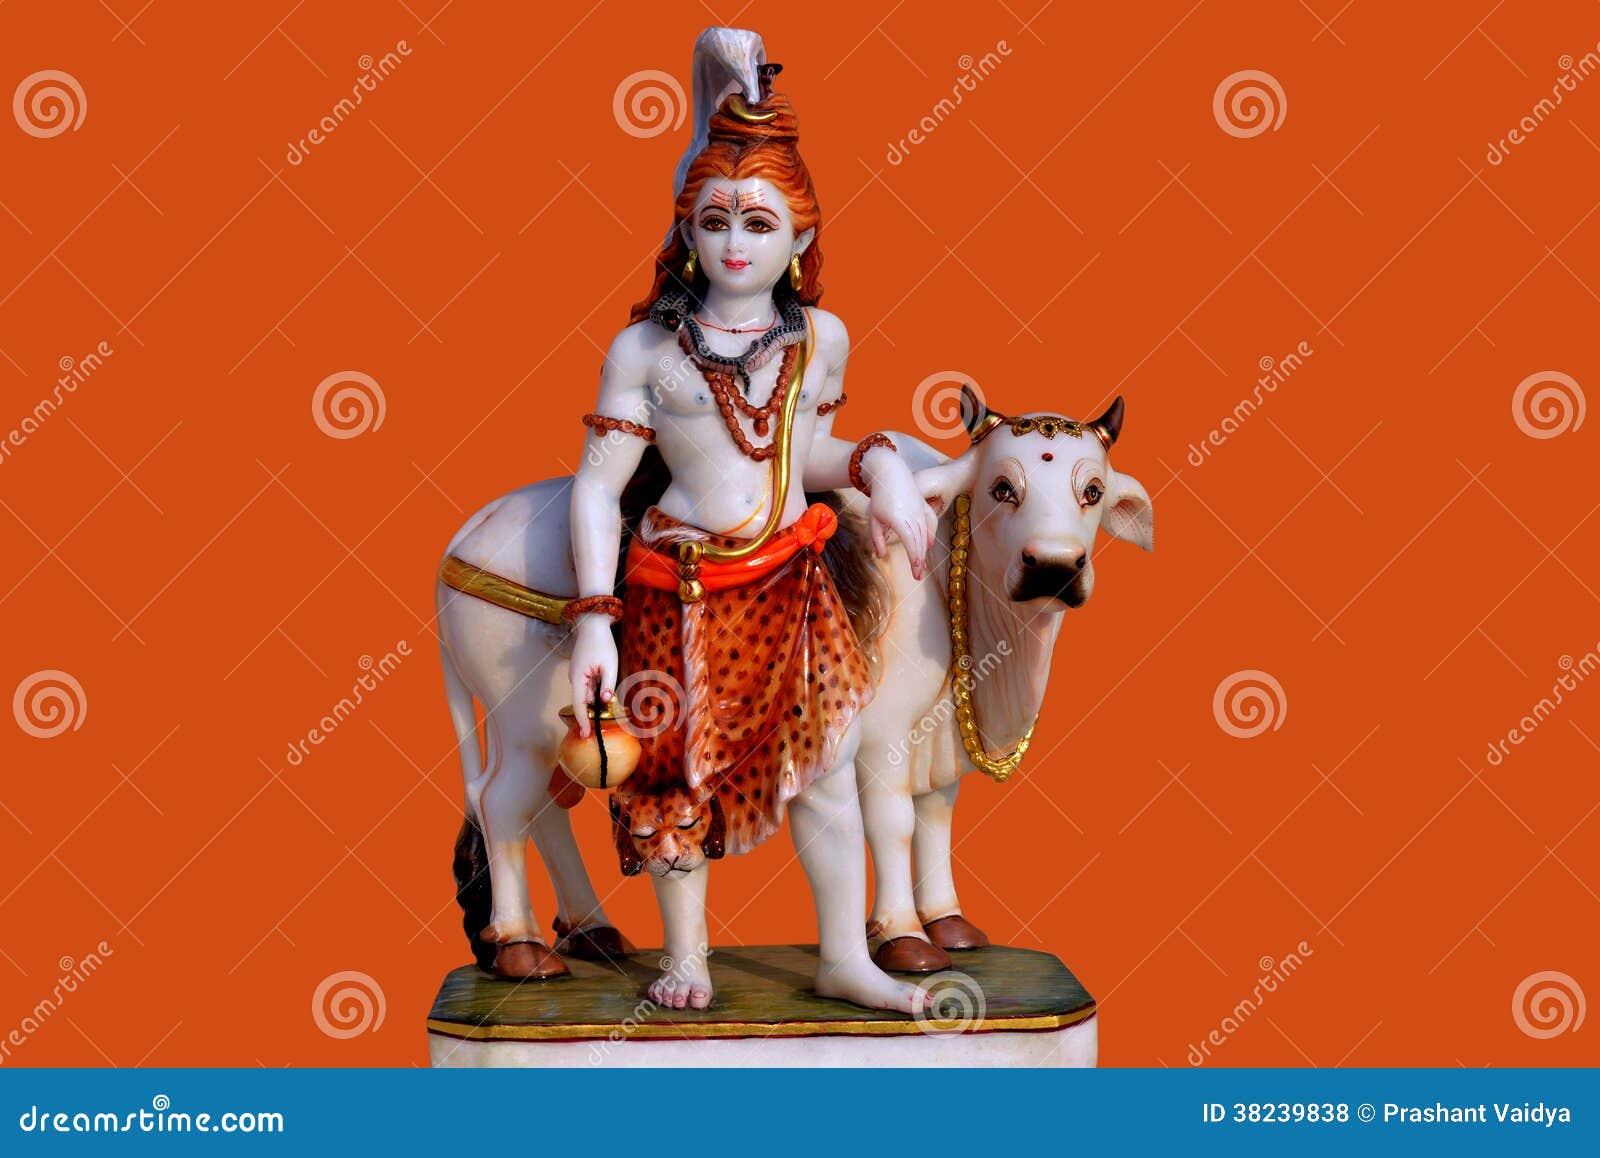 Ídolo de Lord Shiva do mármore